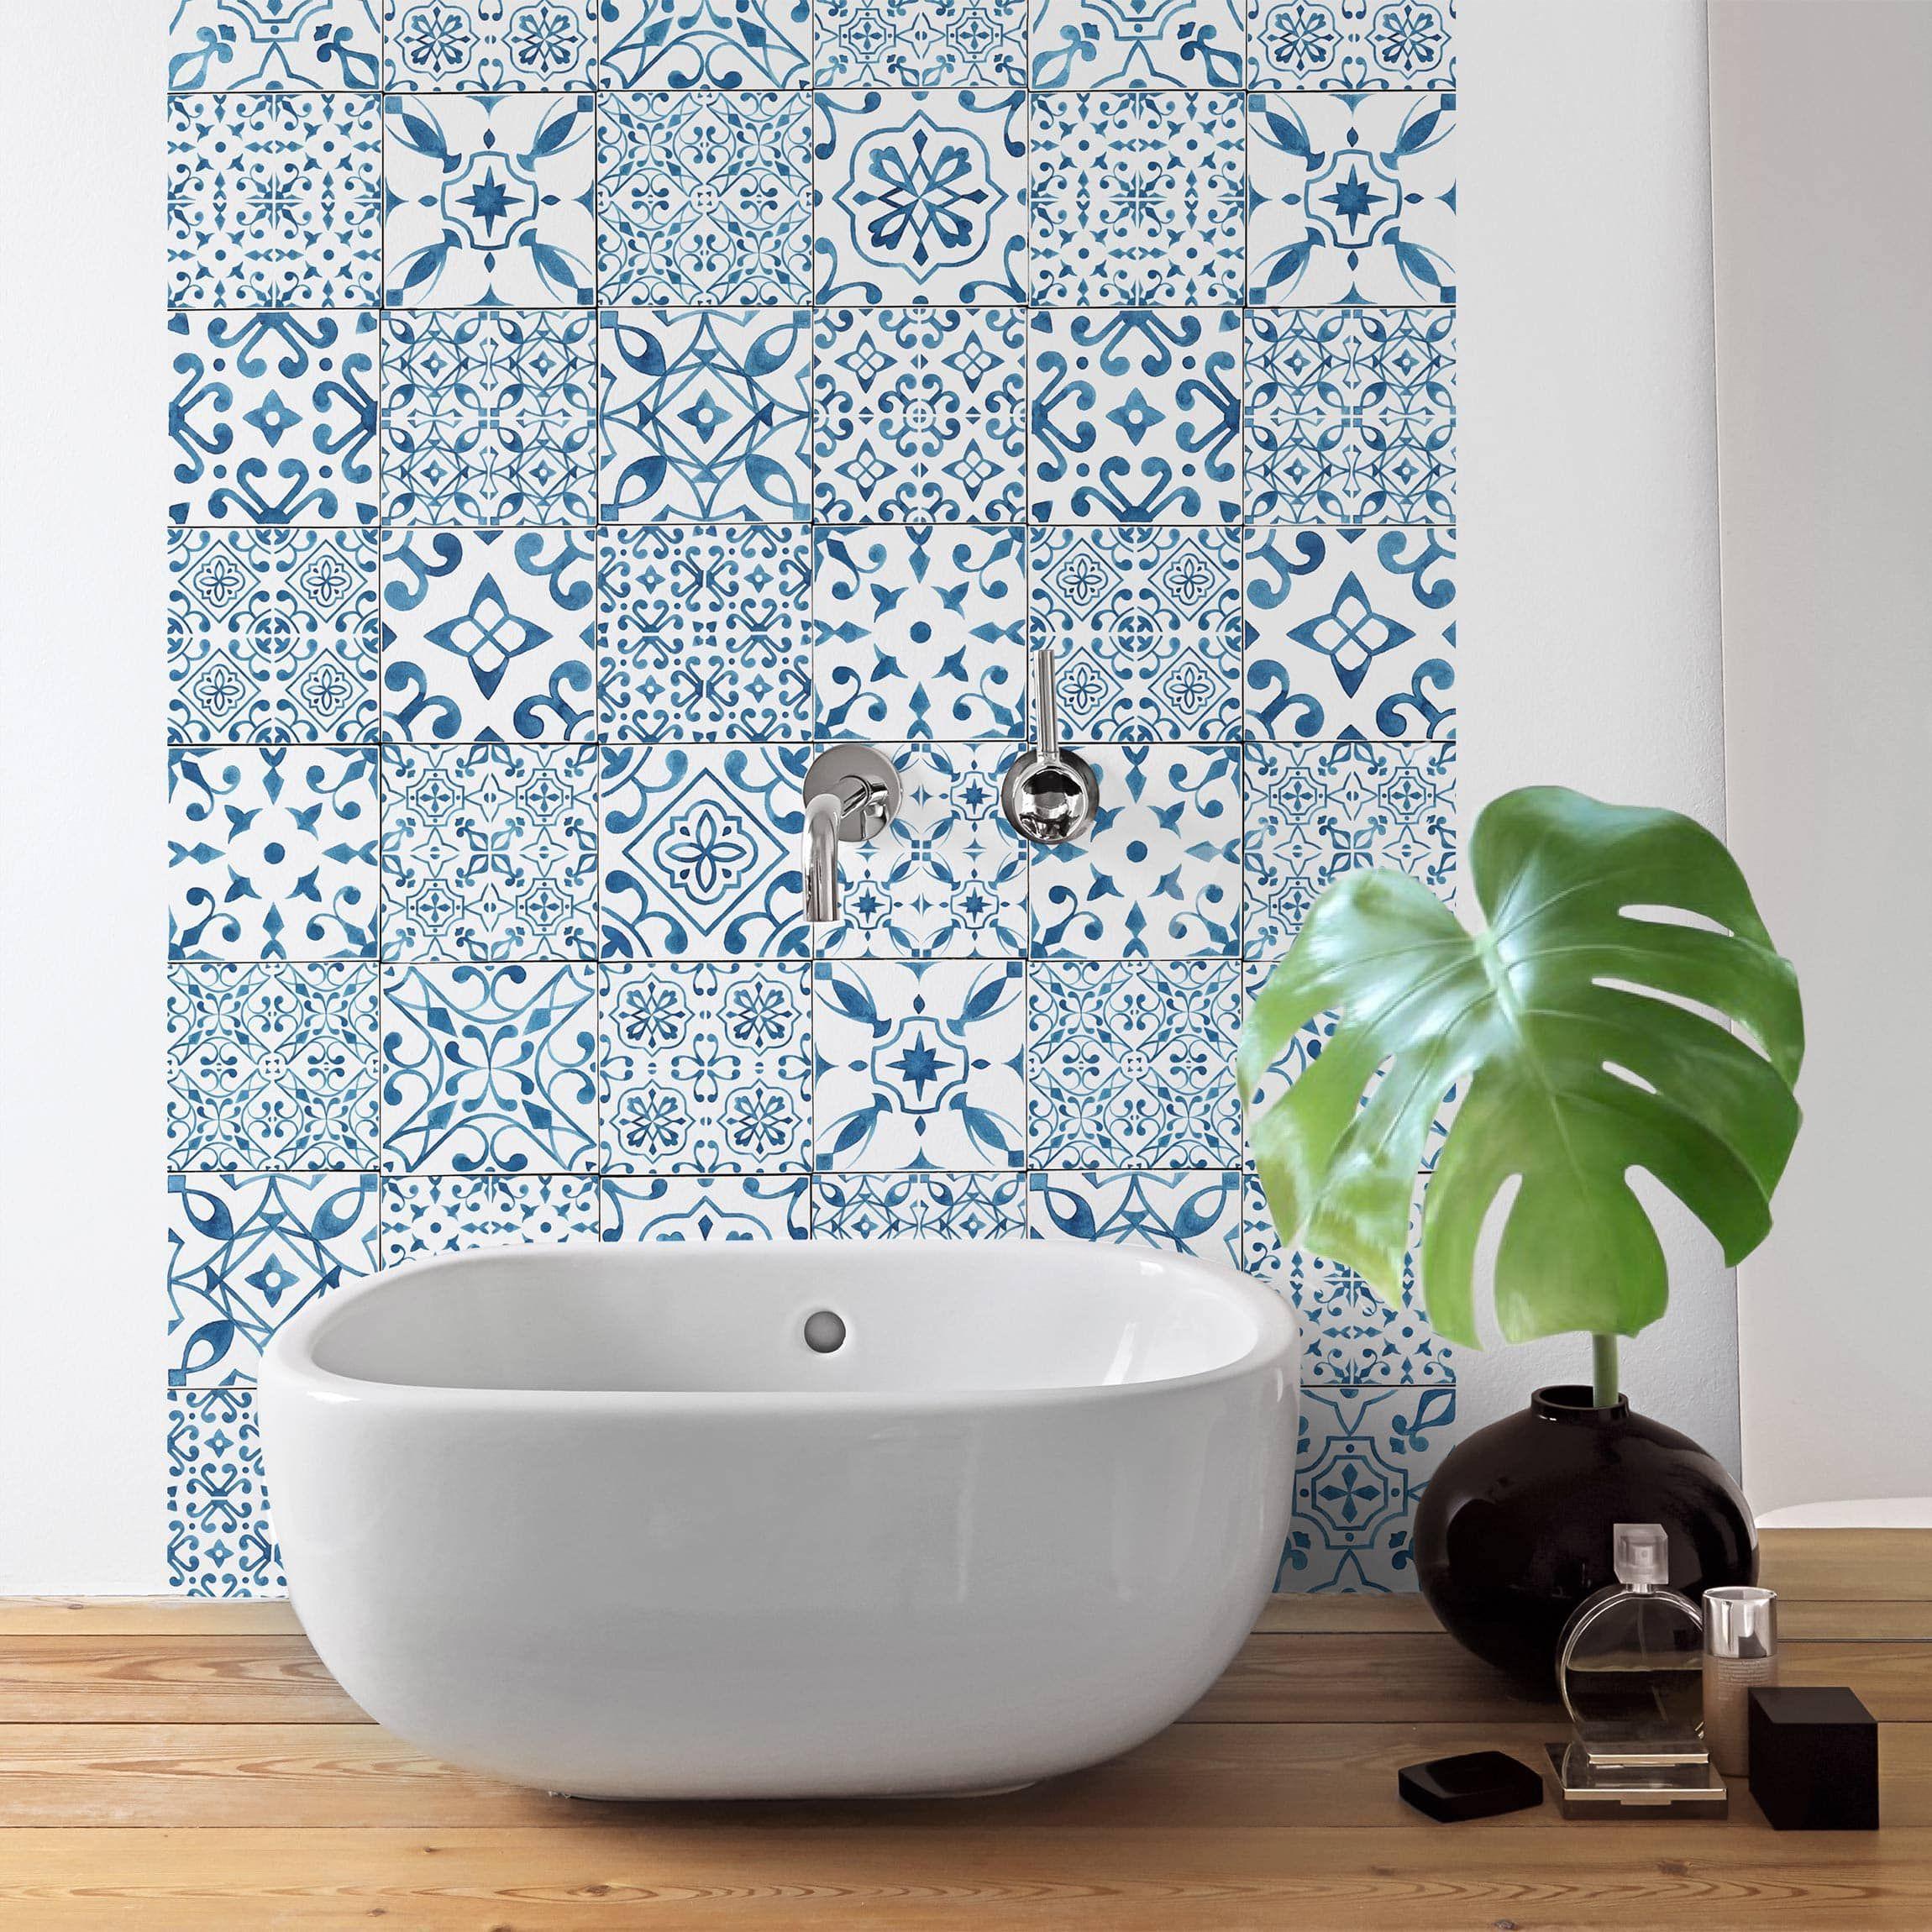 Carta Adesiva per Mobili Pattern Tiles Blue White nel